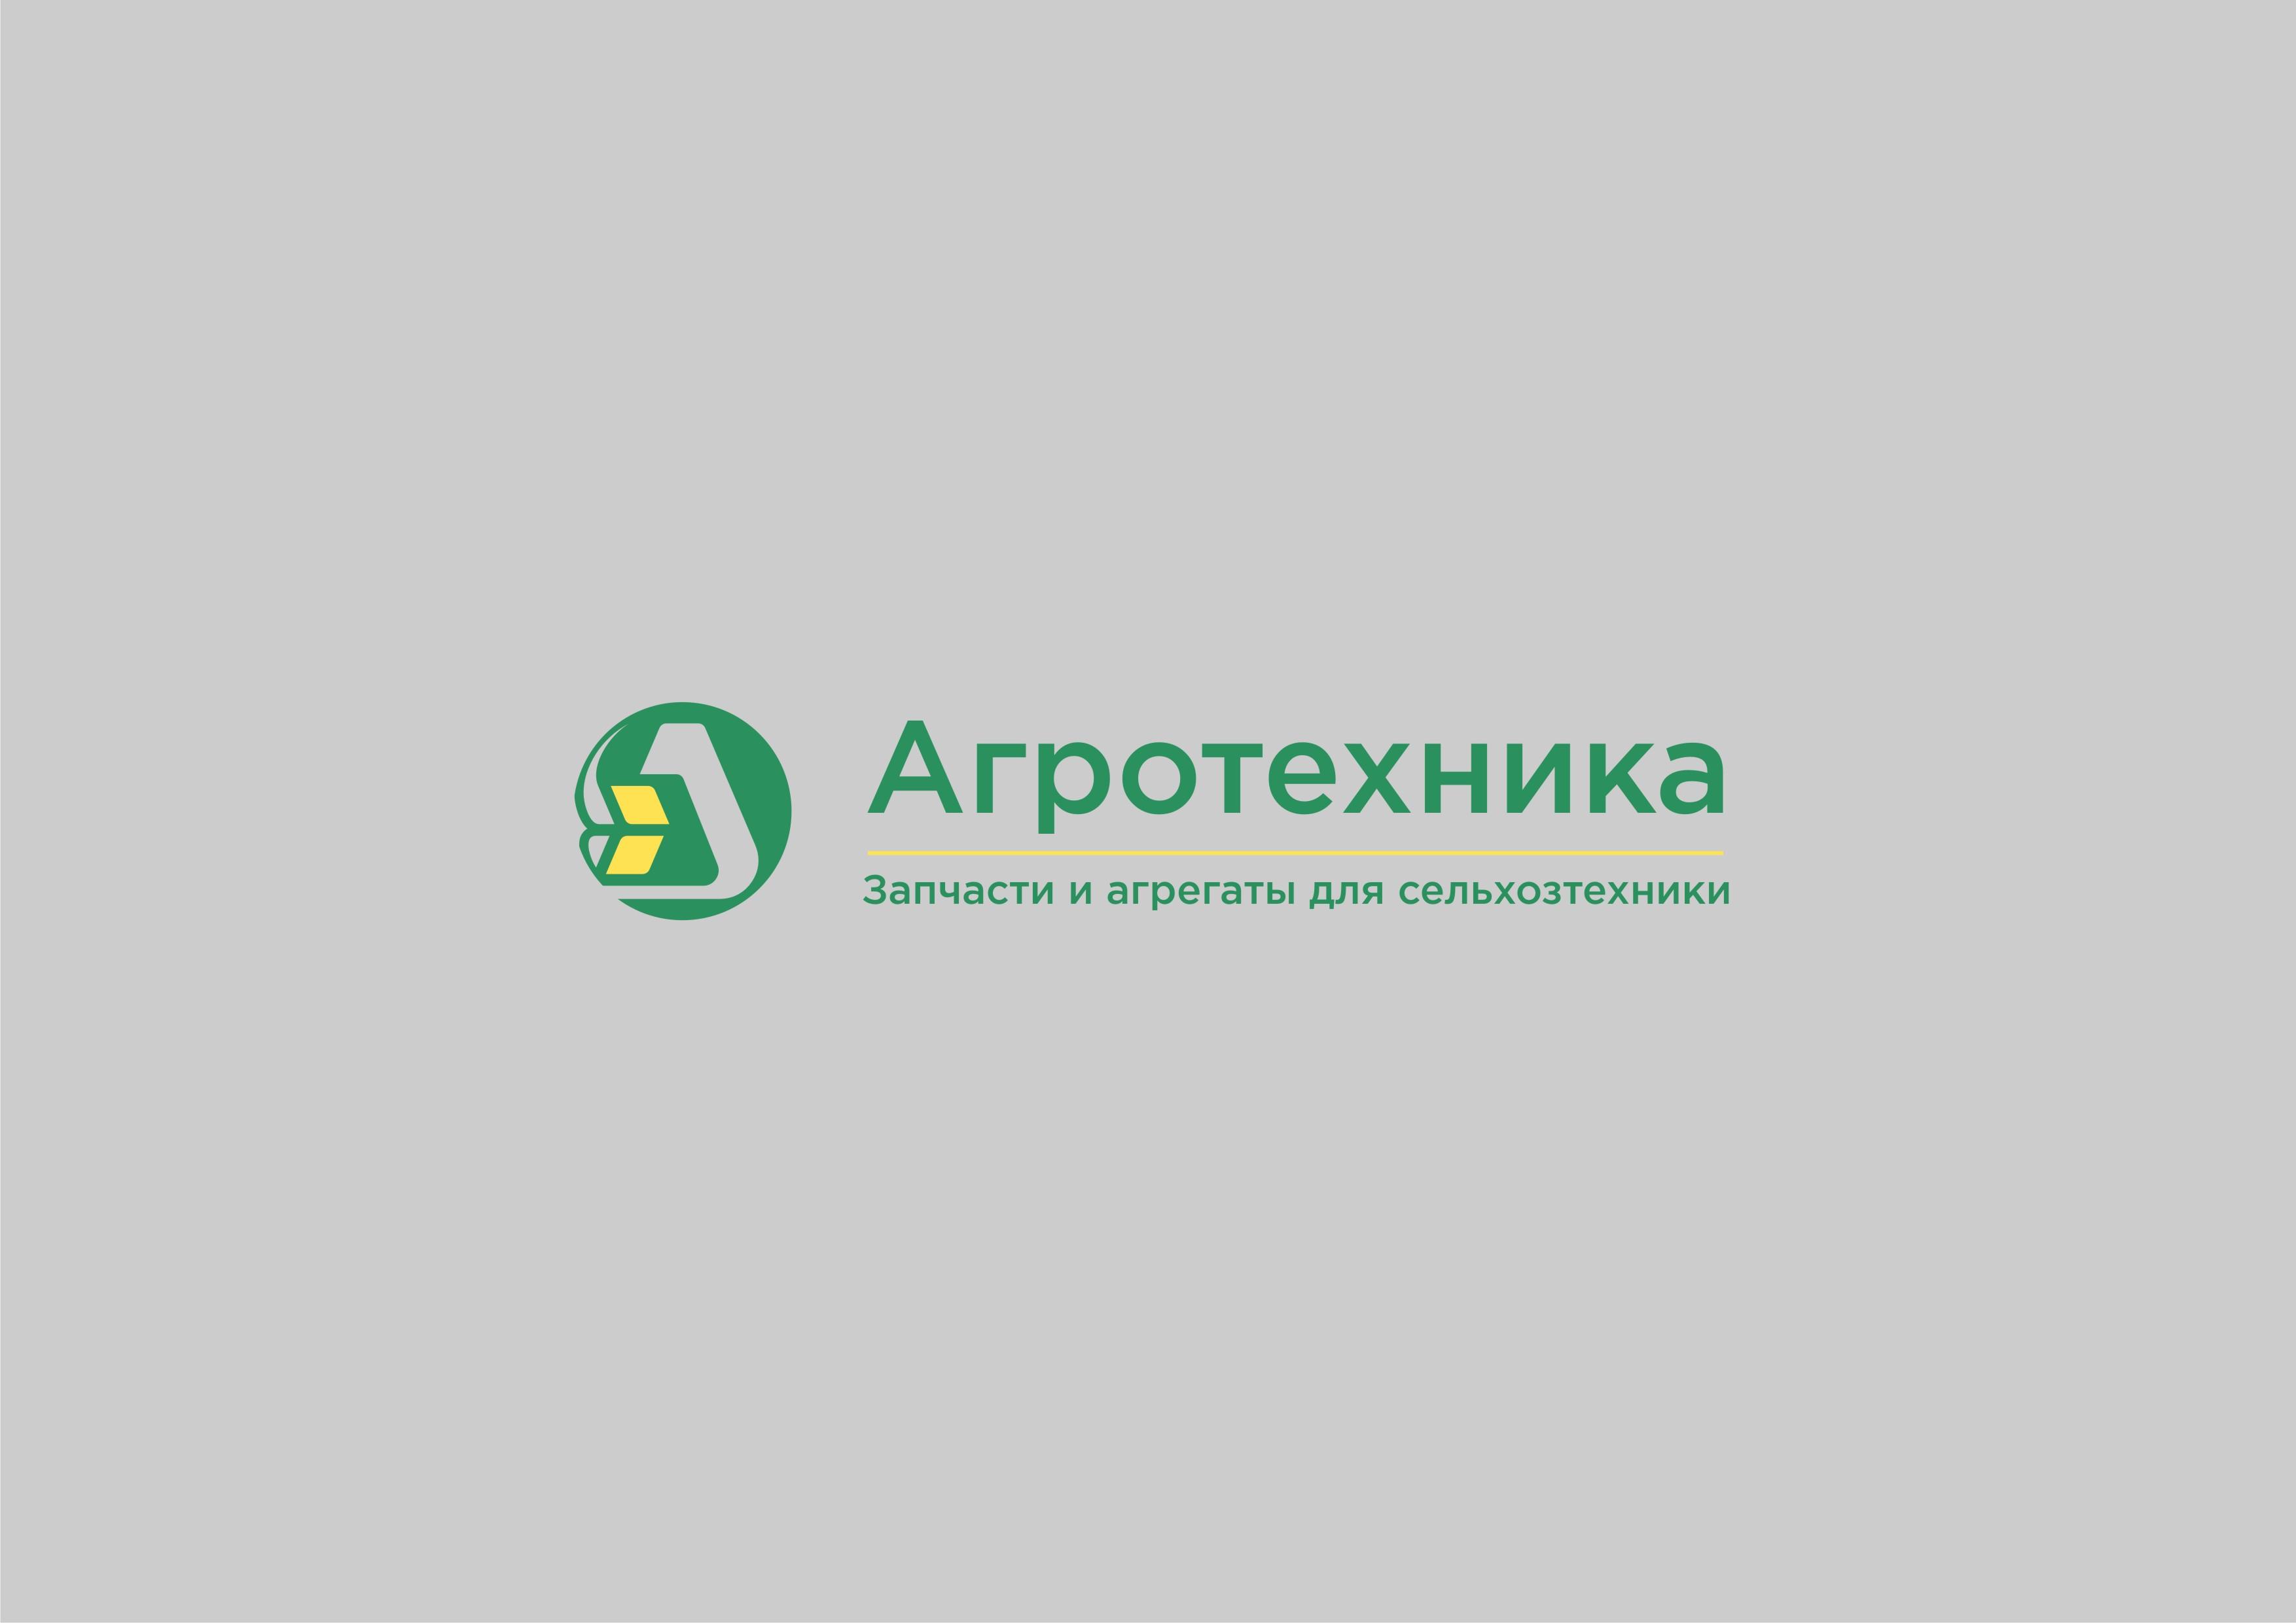 Разработка логотипа для компании Агротехника фото f_1665c0778e9eaaef.jpg